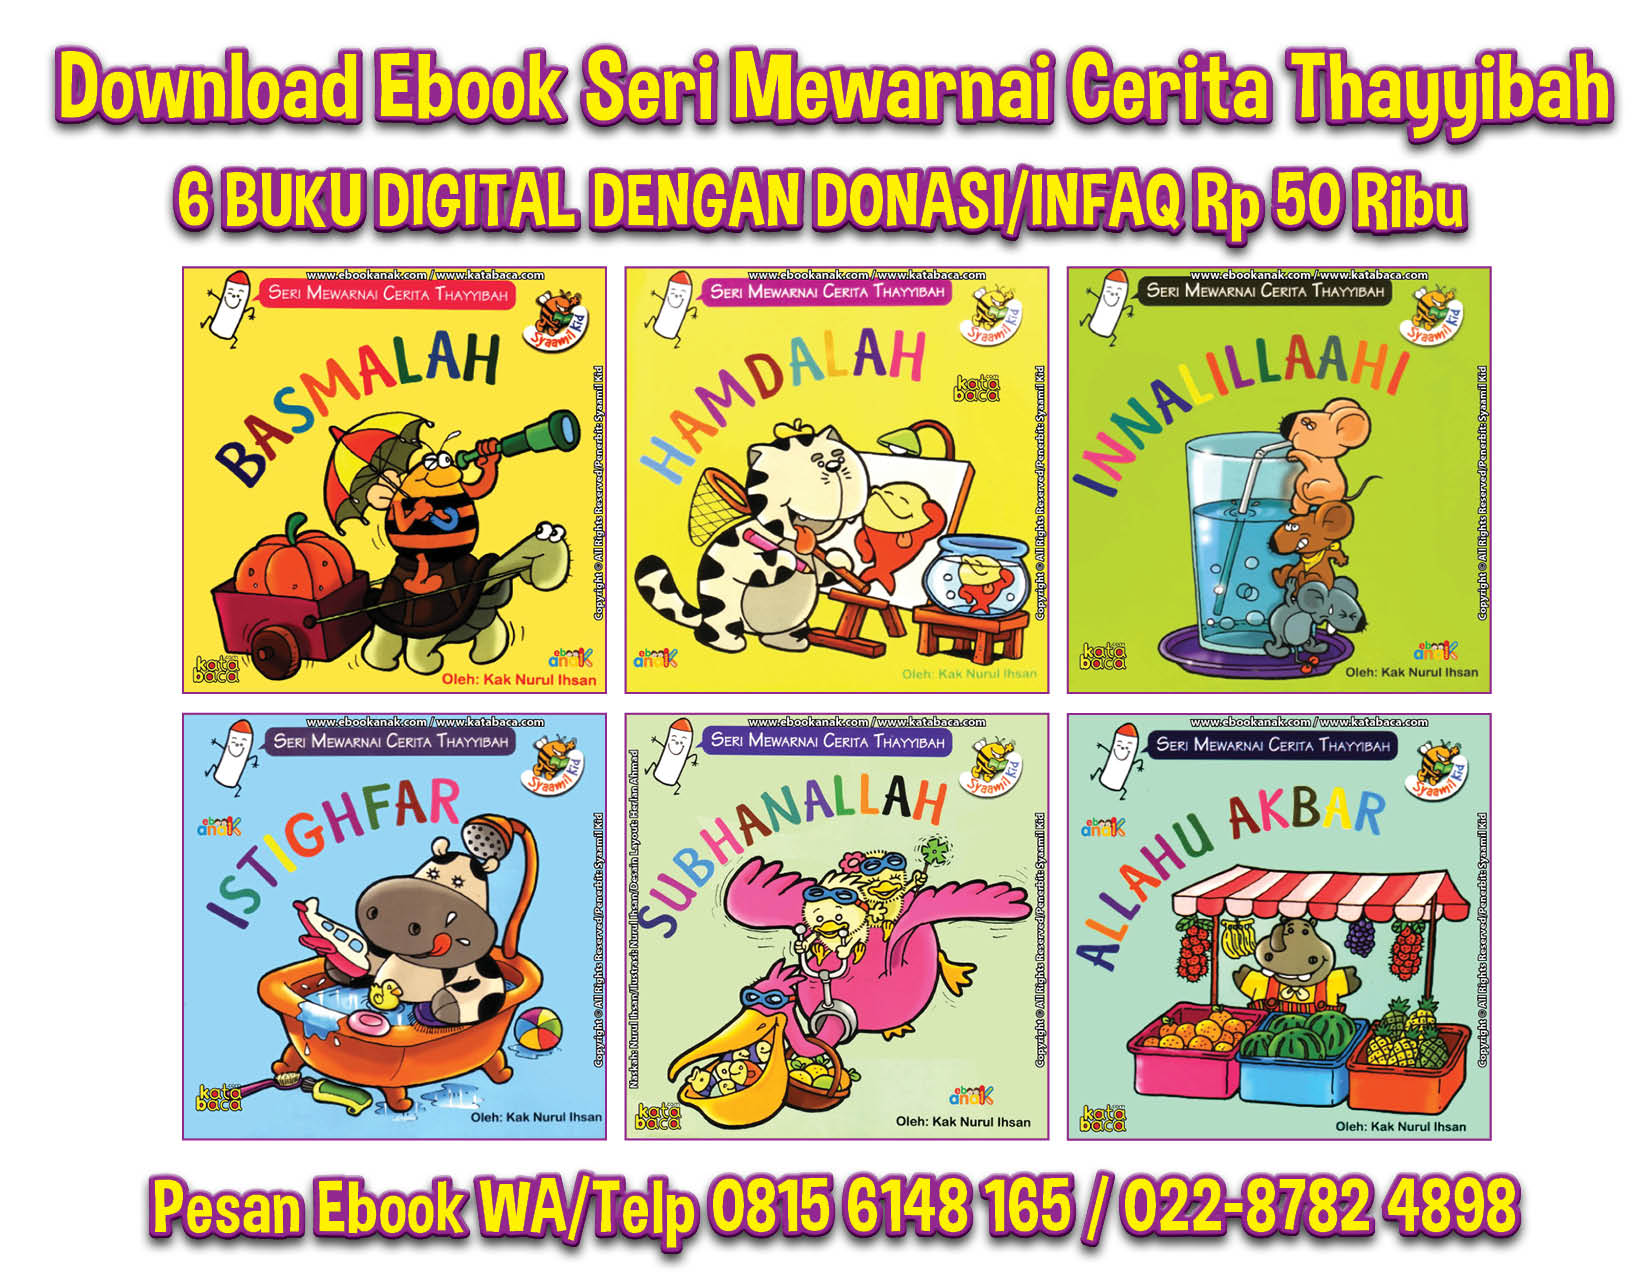 download ebook seri mewarnai cerita thayyibah